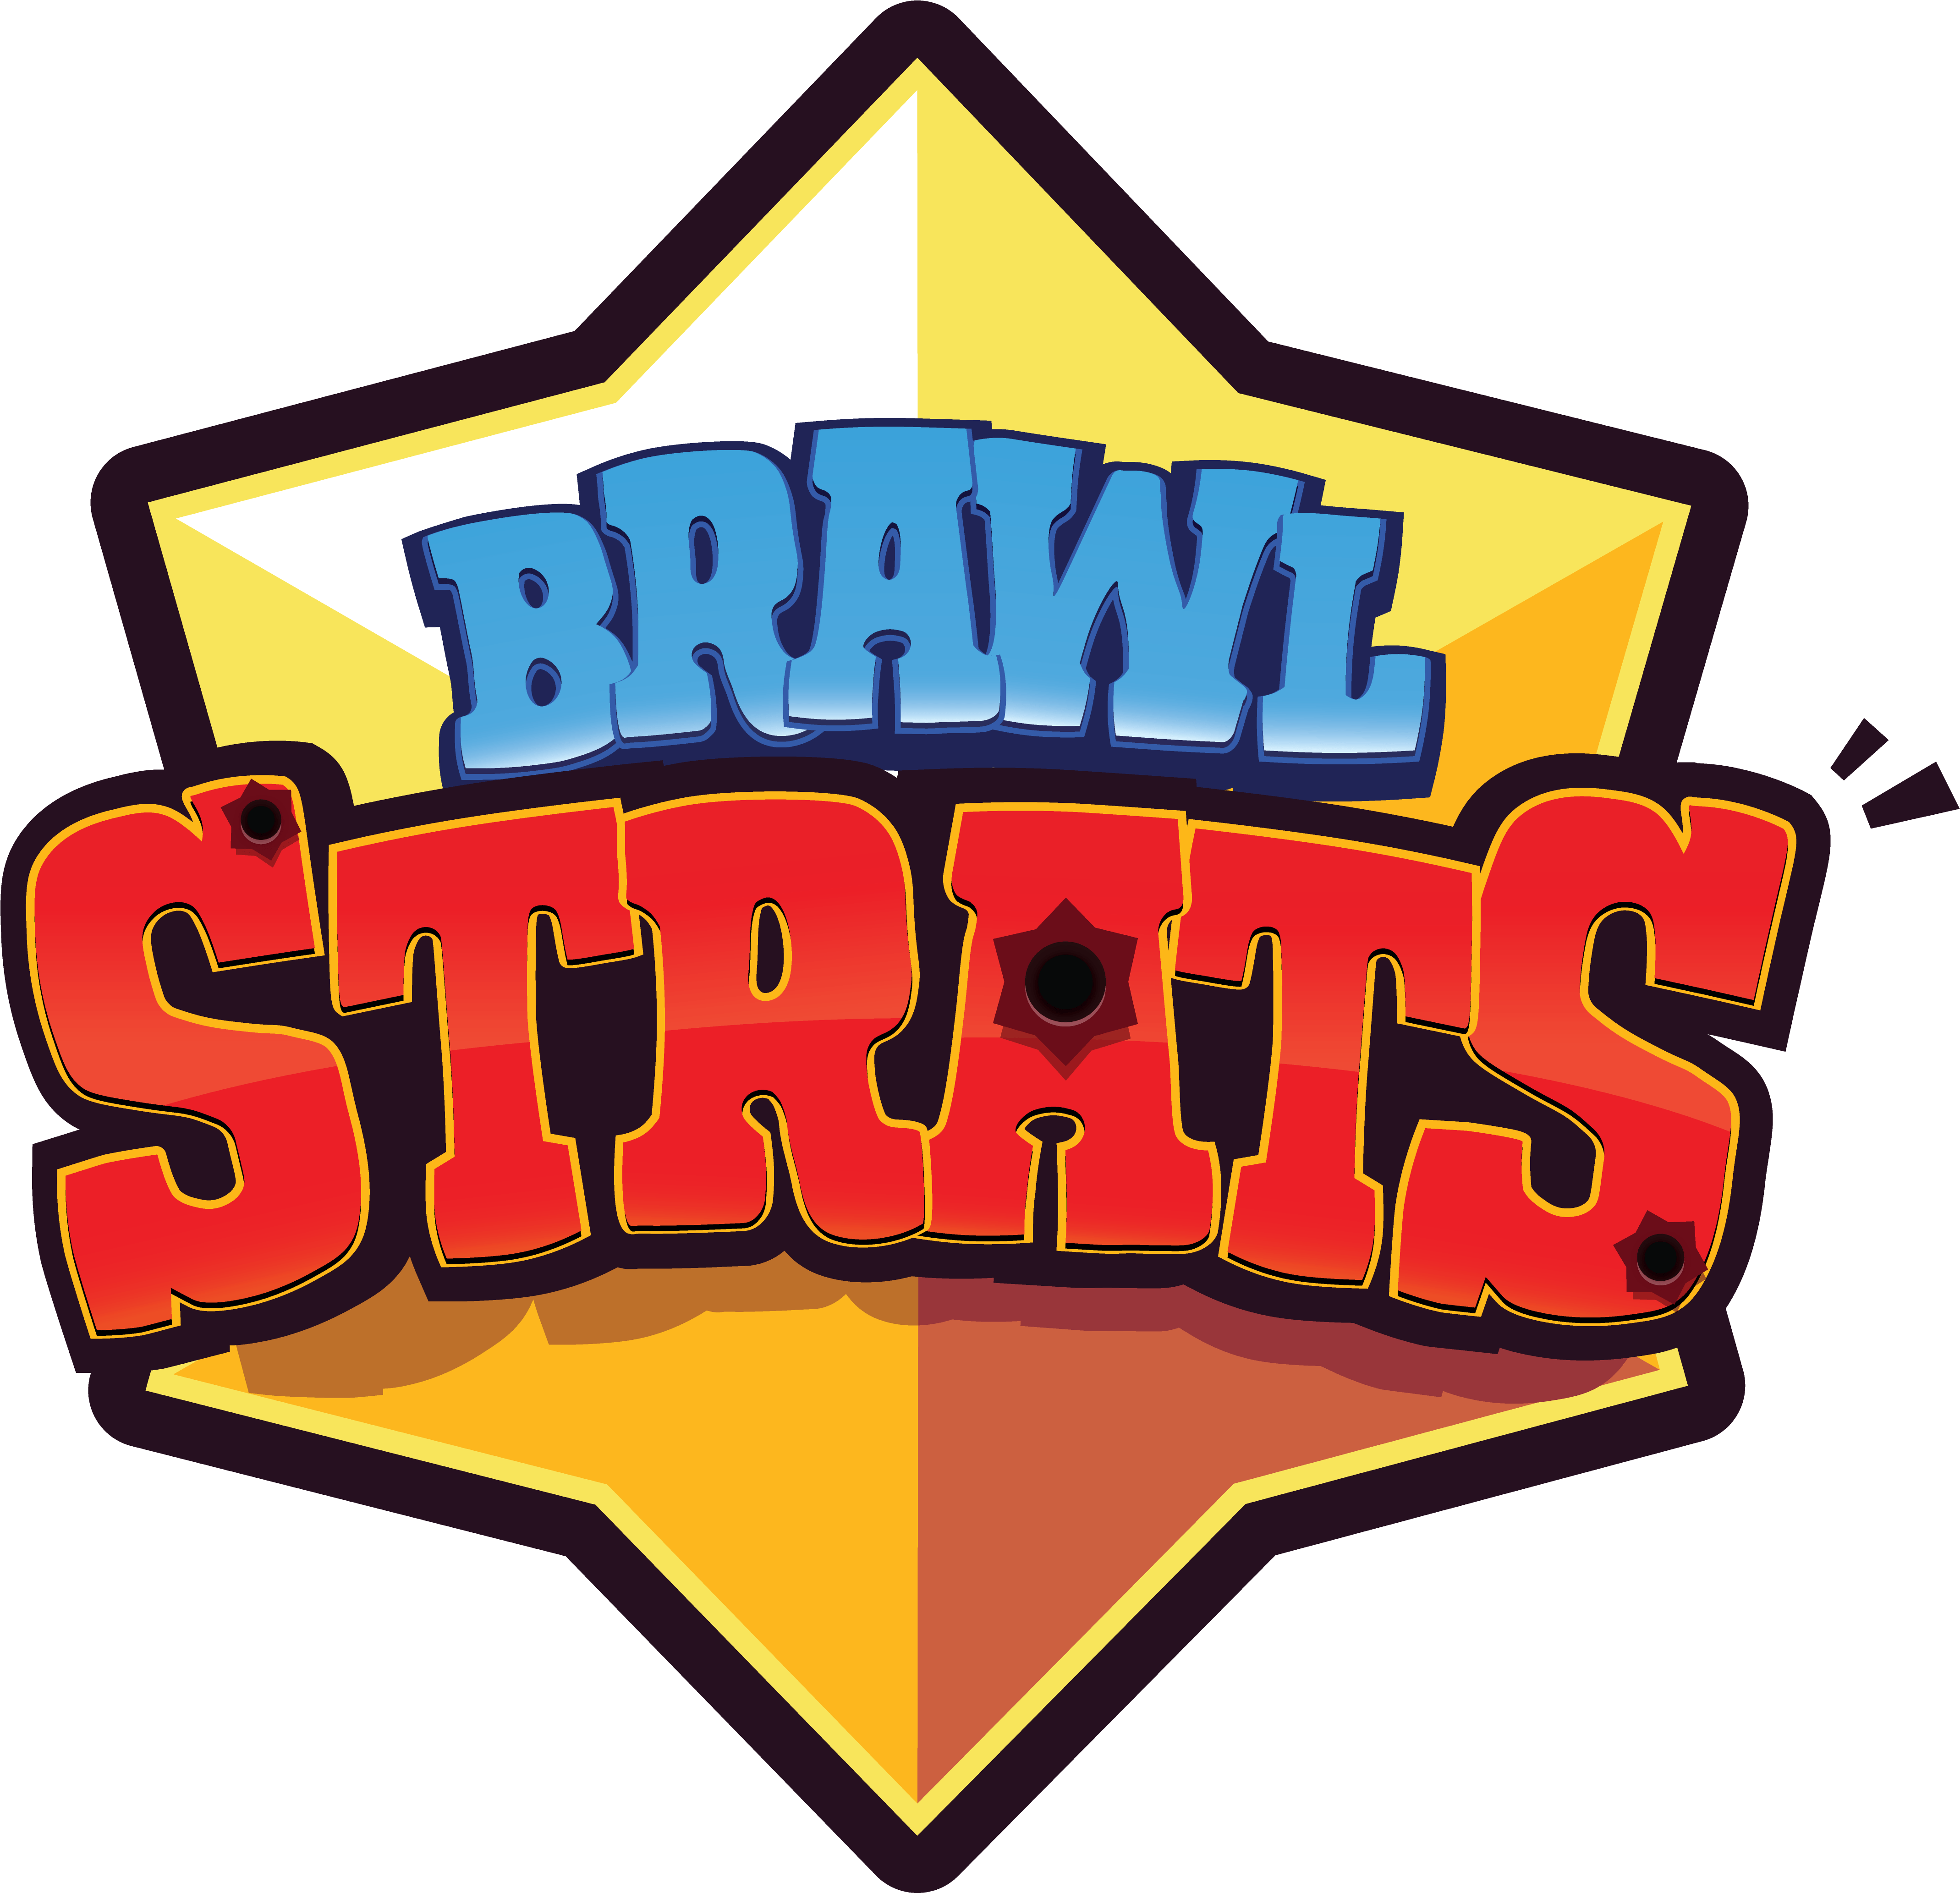 Brawl stars v28.189 (мод) - скачать игру браво старс на андроид